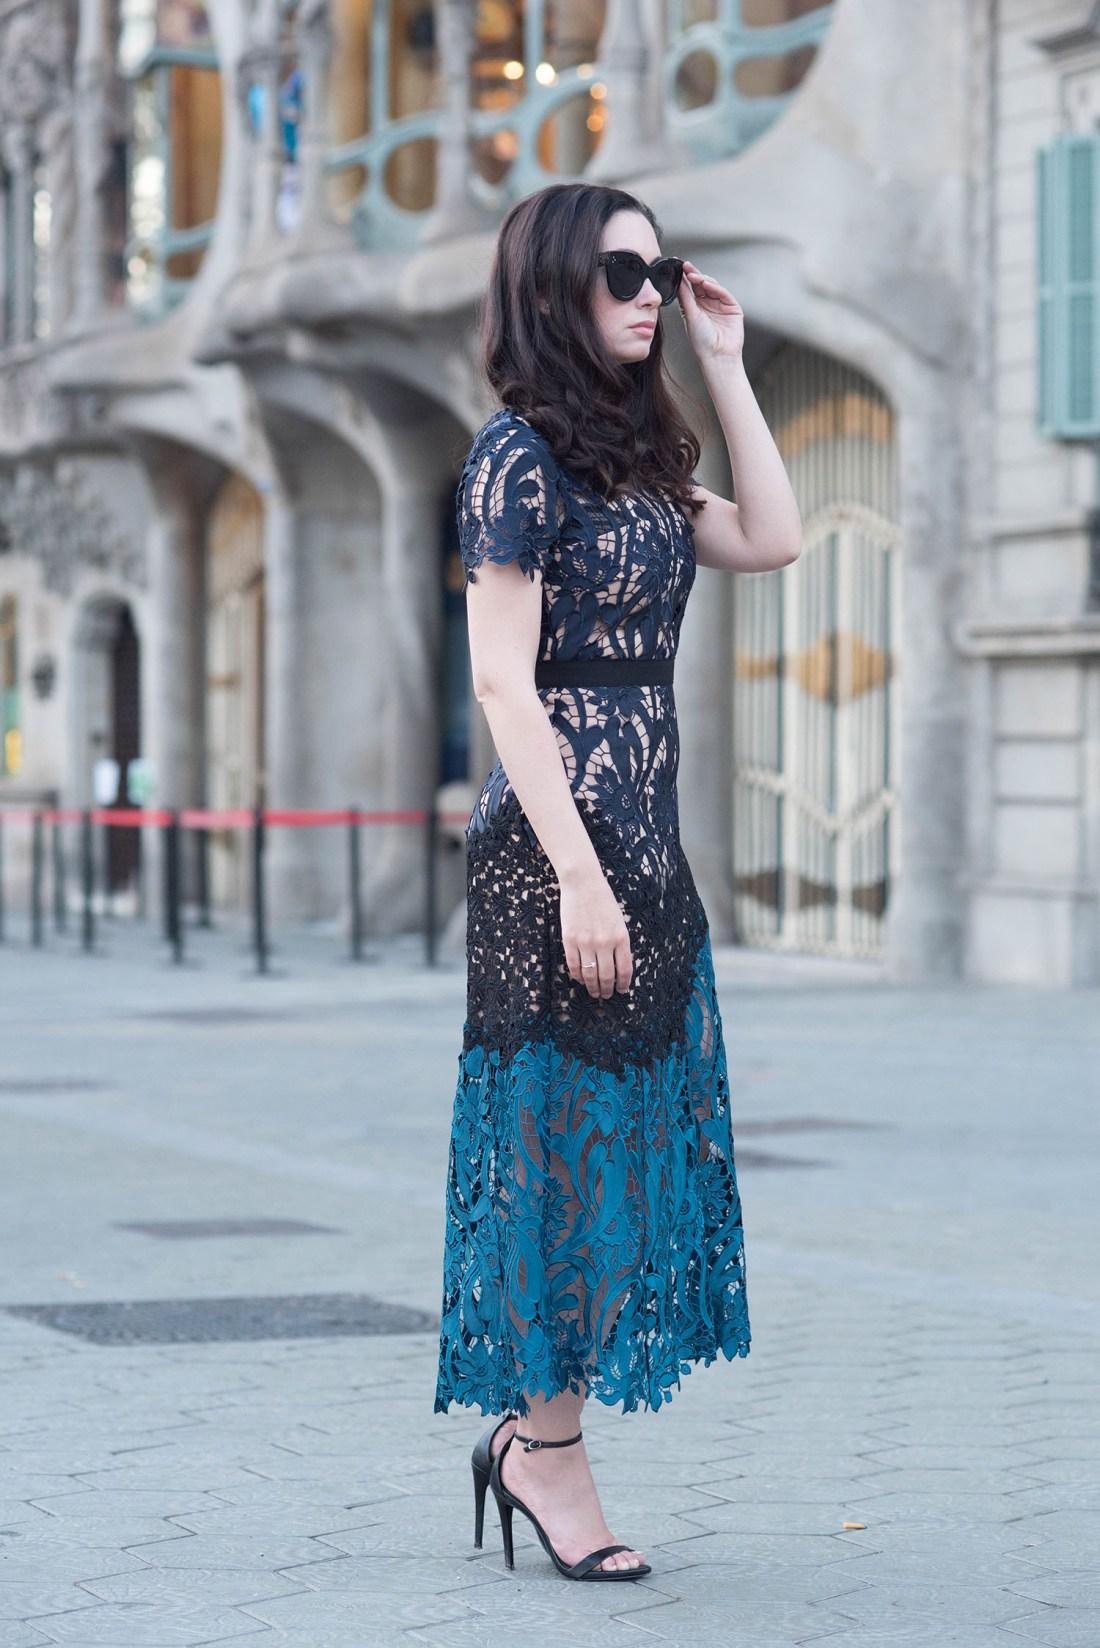 Barcelona street style on fashion blogger Cee Fardoe of Coco & Vera, wearing Self-Portrait